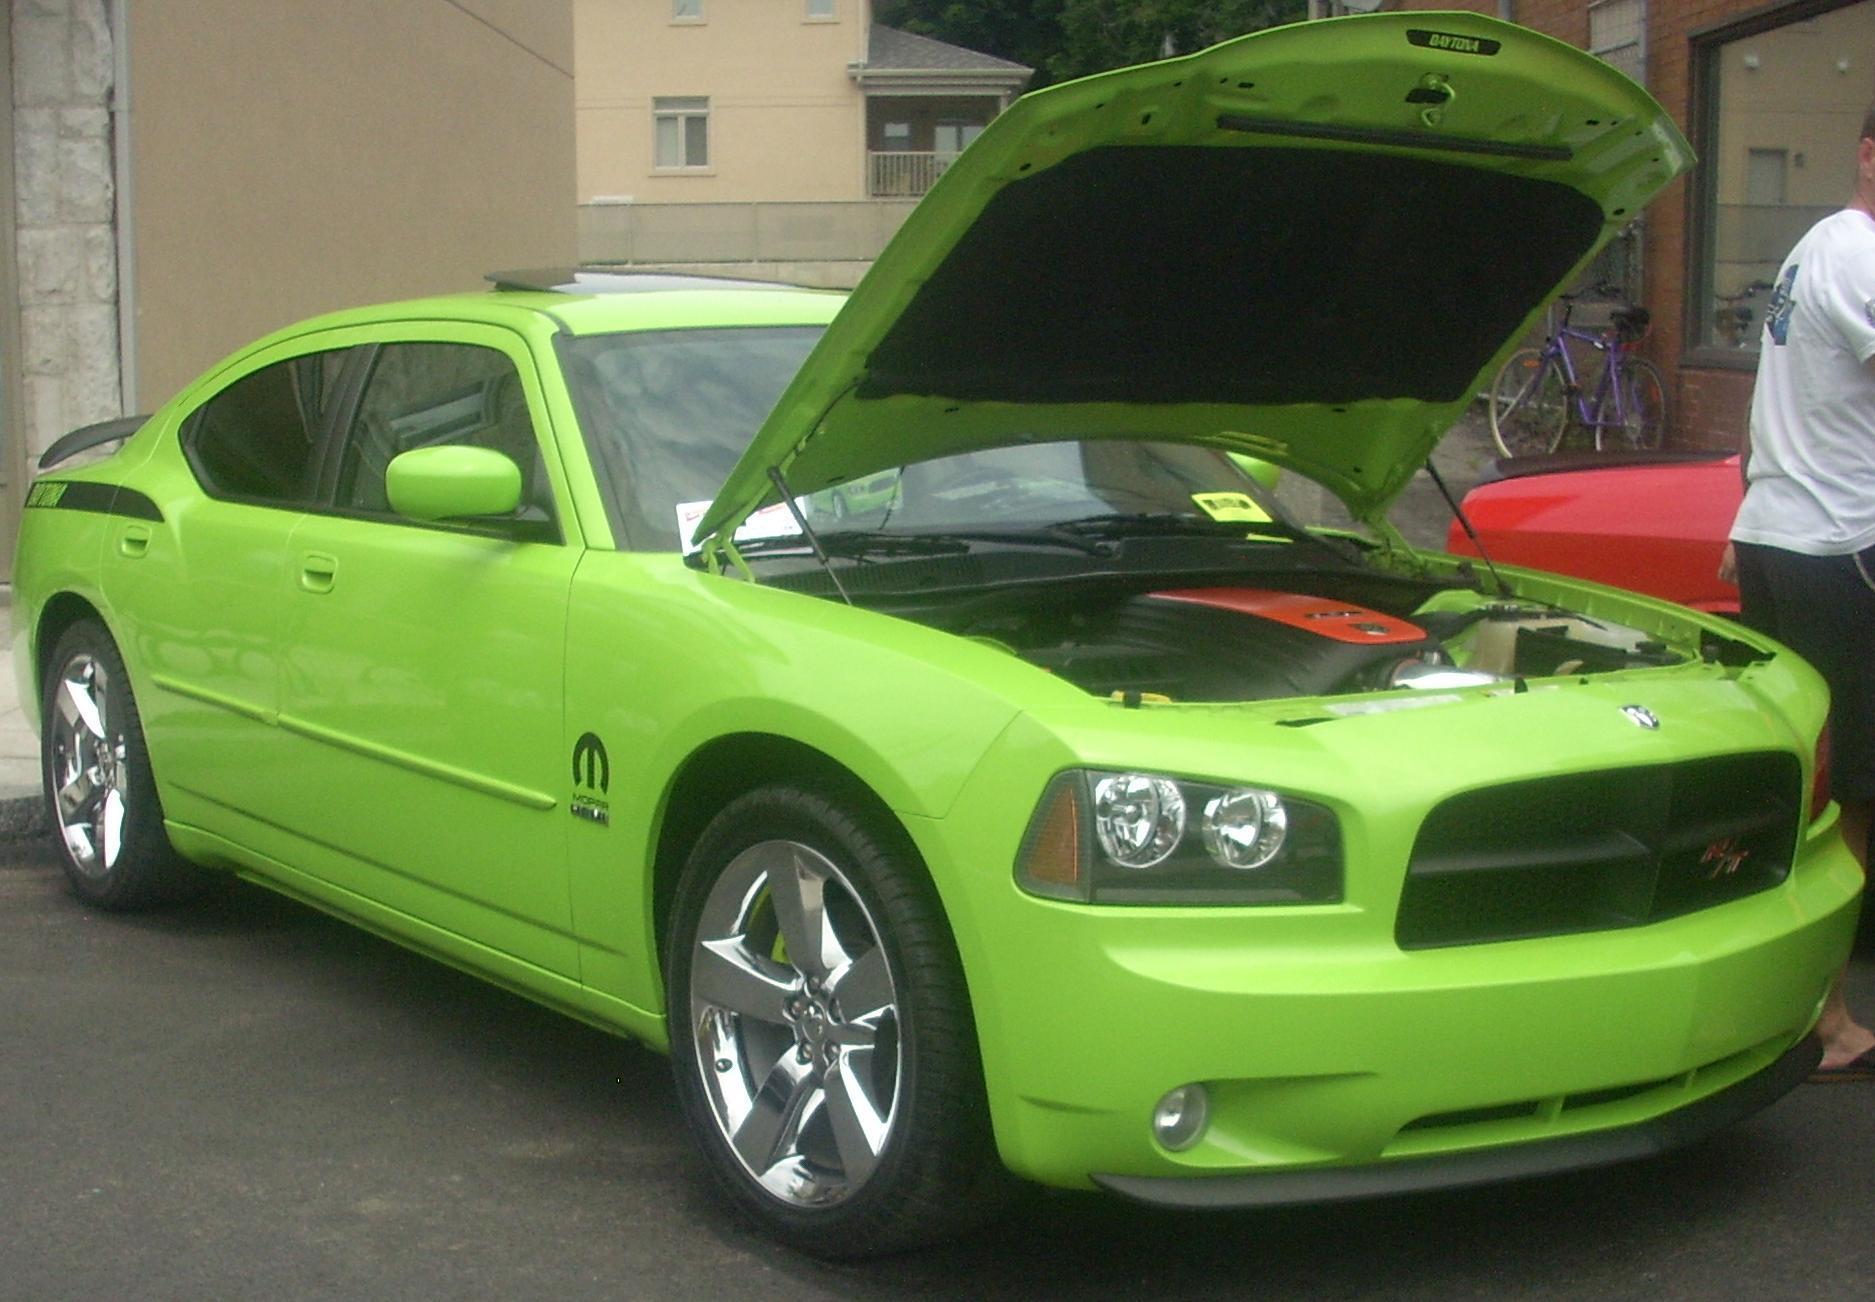 Boardwalk Chrysler Dodge Jeep Ram Vehicles For Sale In